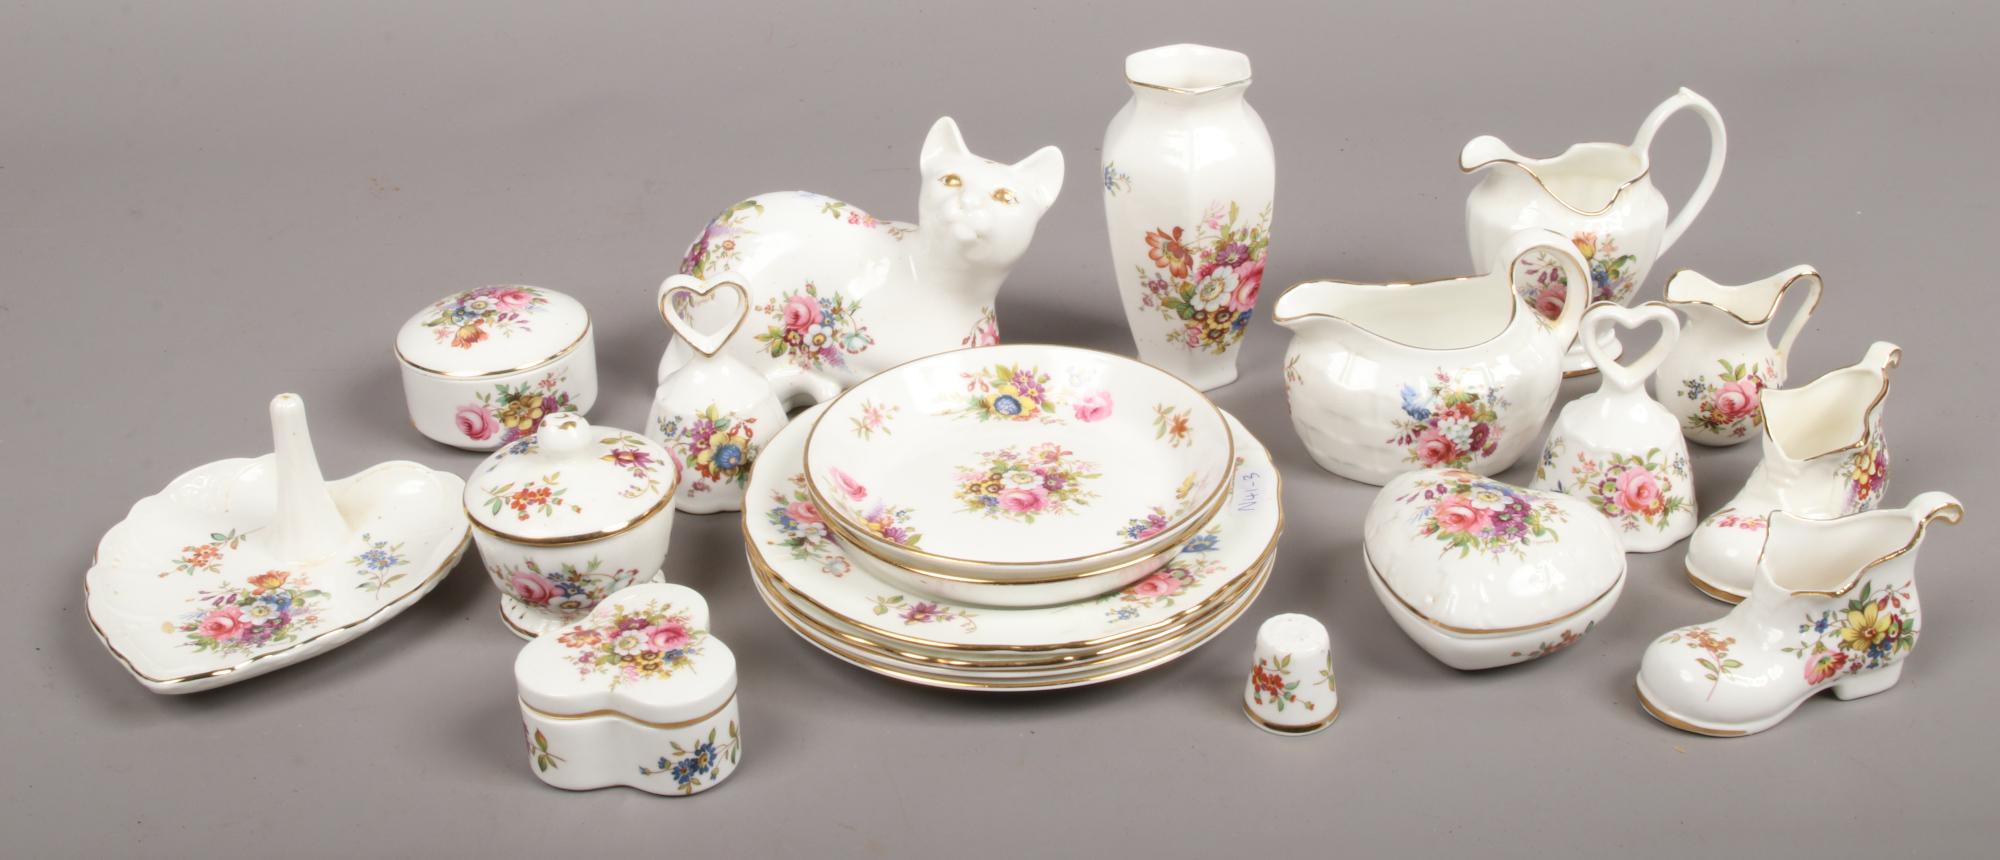 Lot 34 - A quantity of Hammersley bone china ornaments, mostly Howard Sprays design.